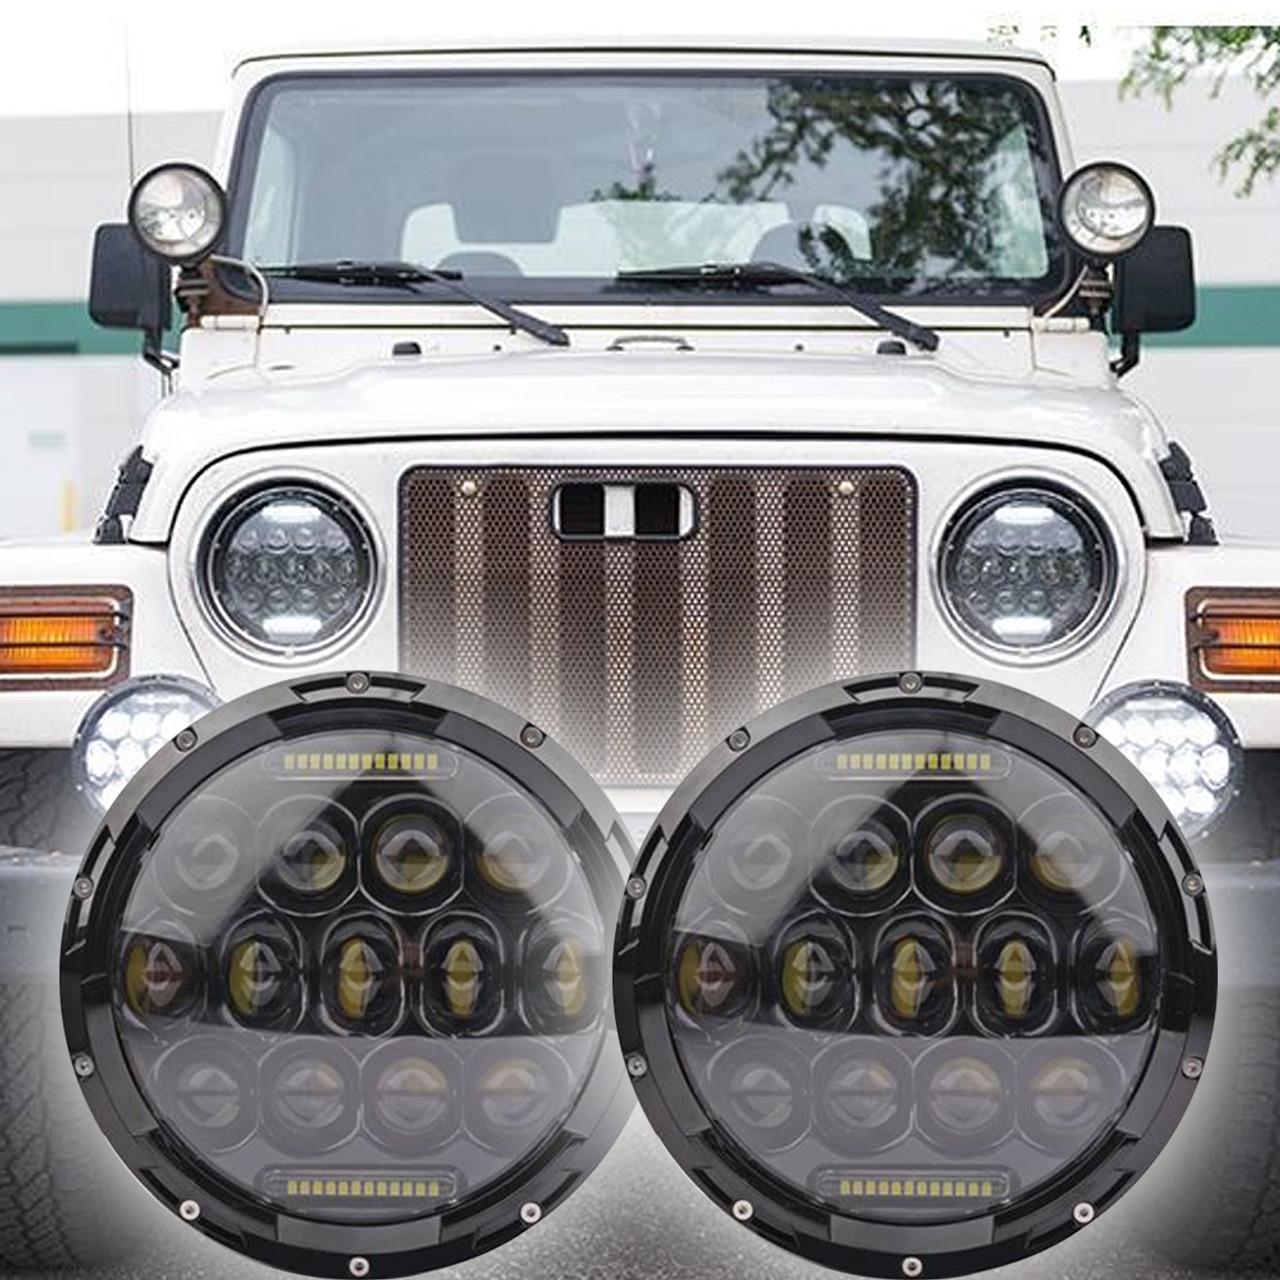 1996 2006 jeep wrangler tj led headlight kit oracle 75w black projector style [ 1000 x 1000 Pixel ]